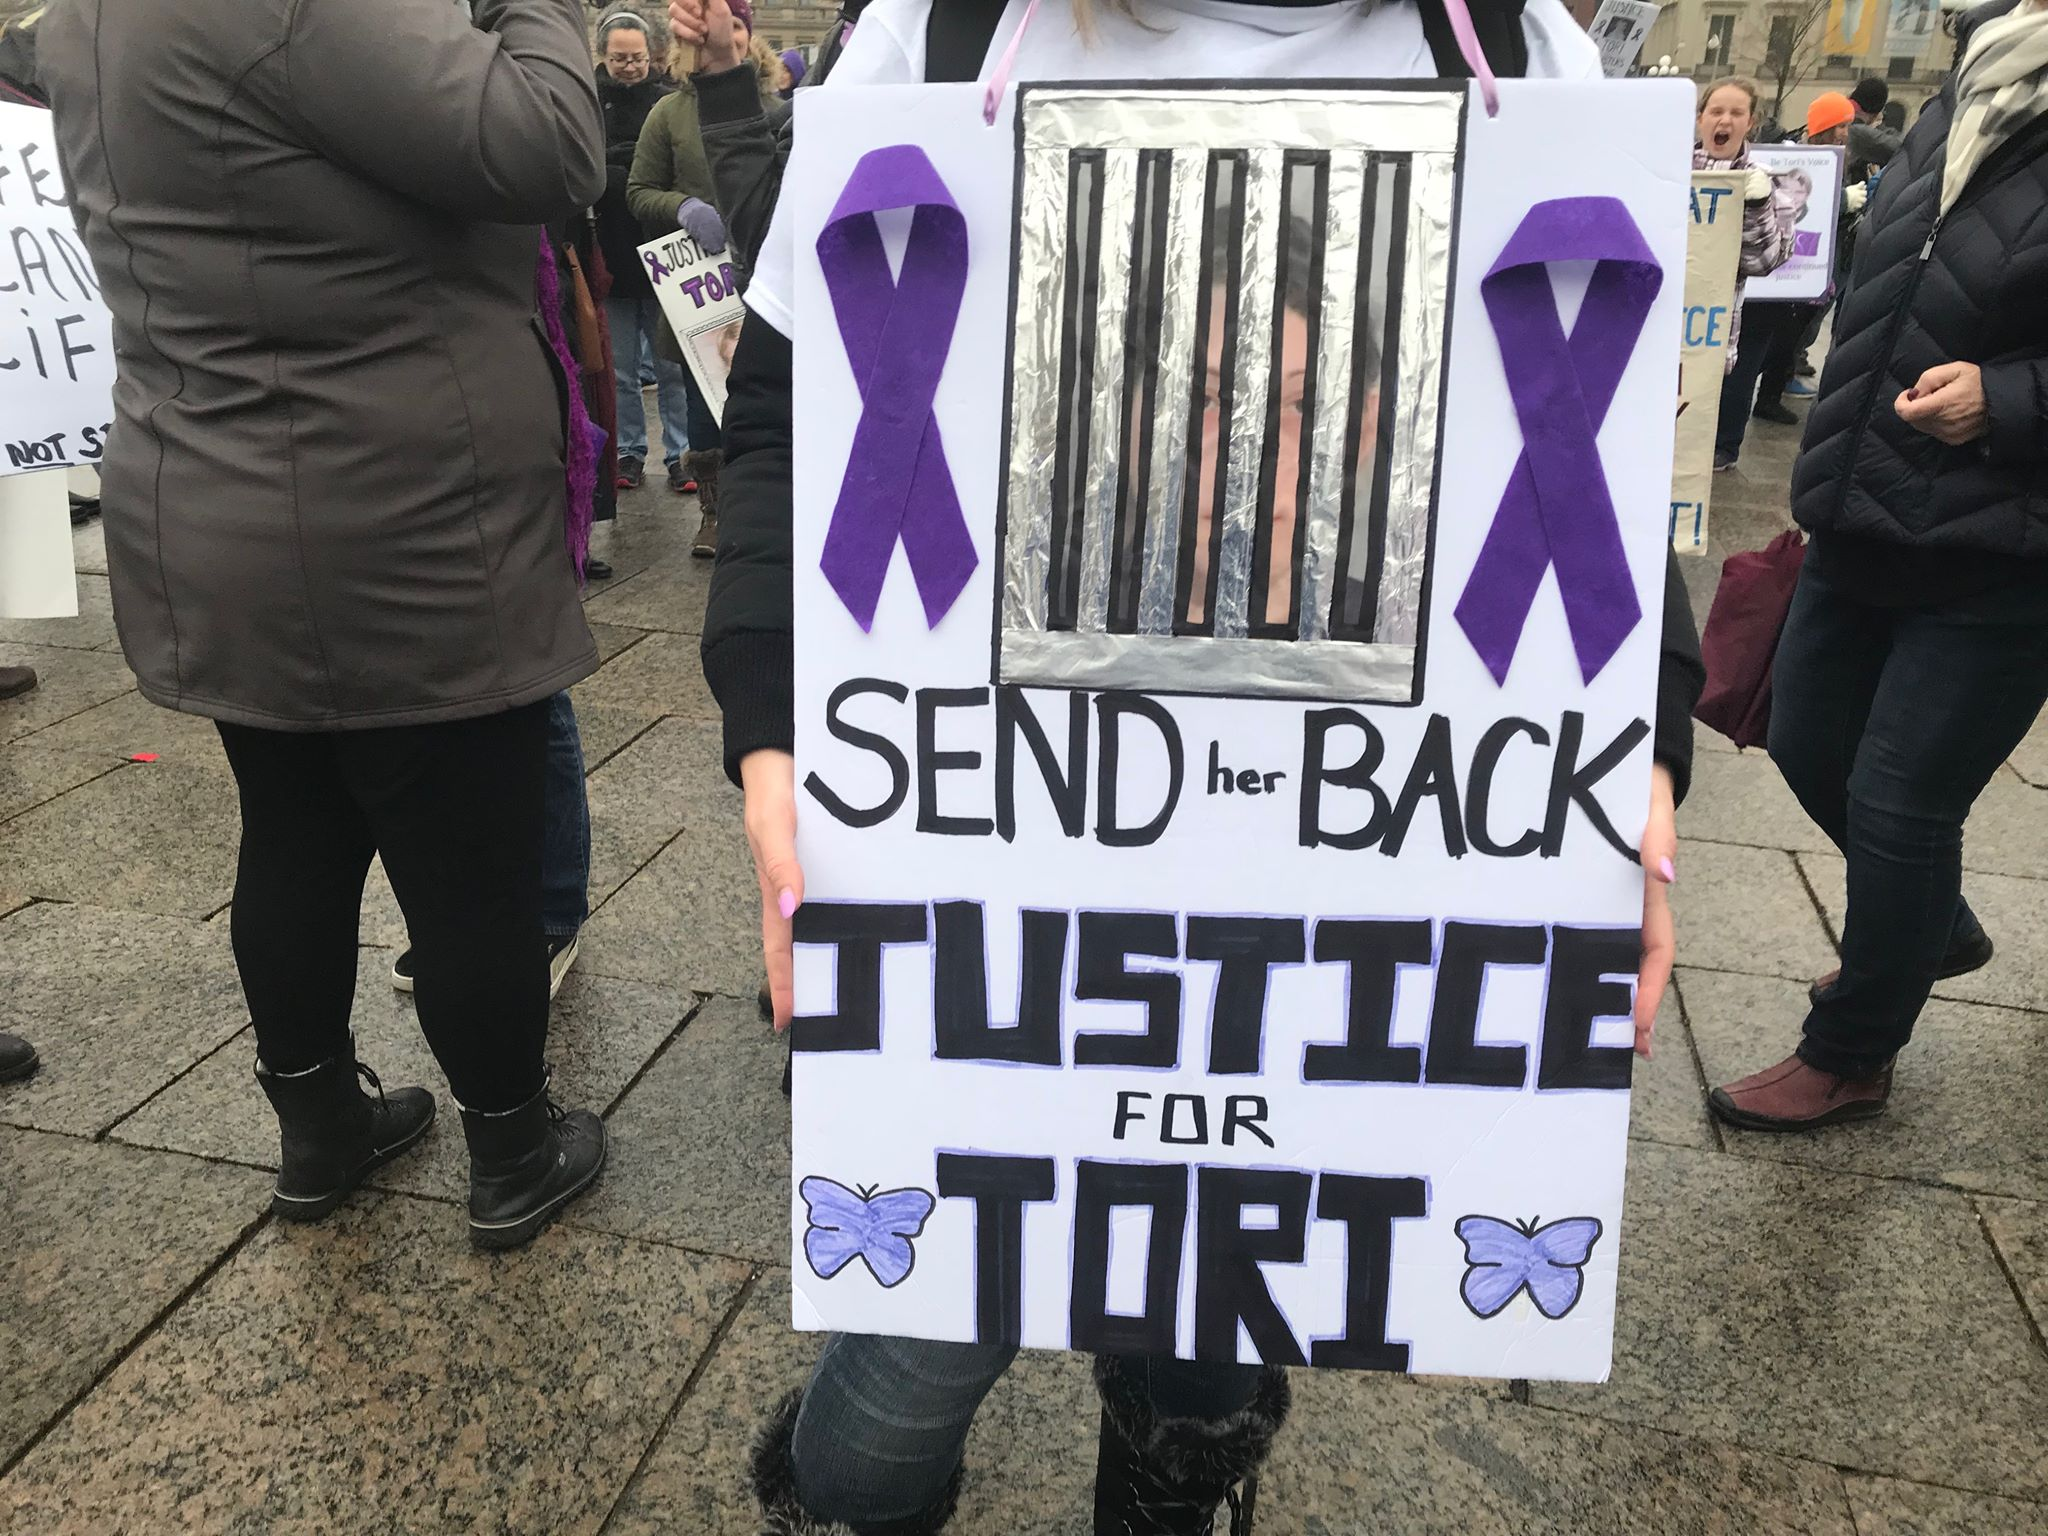 Terri-Lynne McClintic sent back behind bars